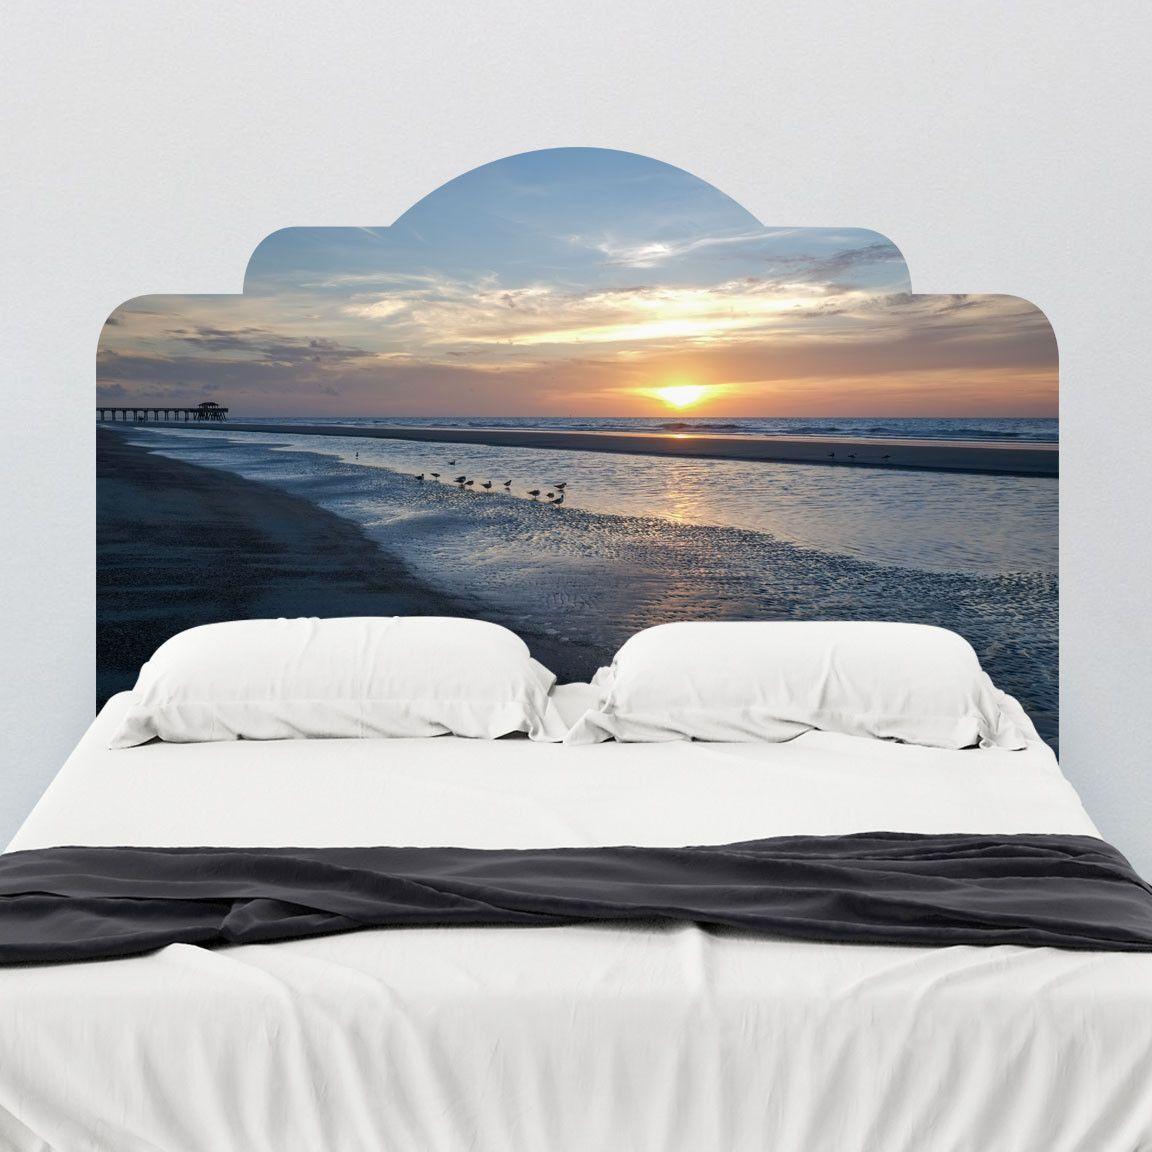 Paul Moore's Sunset Seagull Beach Adhesive Headboard wall decal